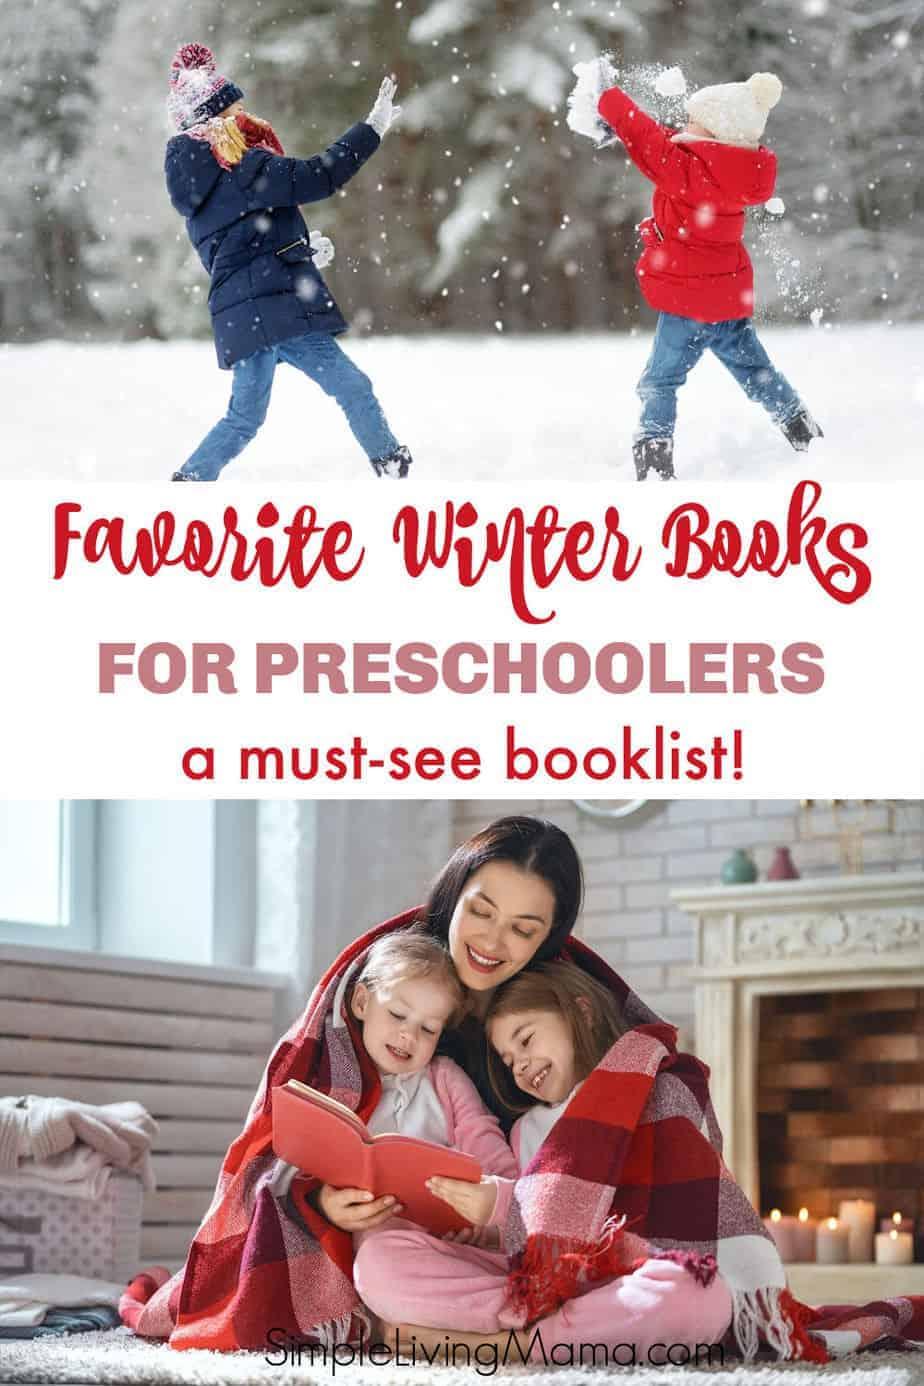 Favorite winter books for preschoolers